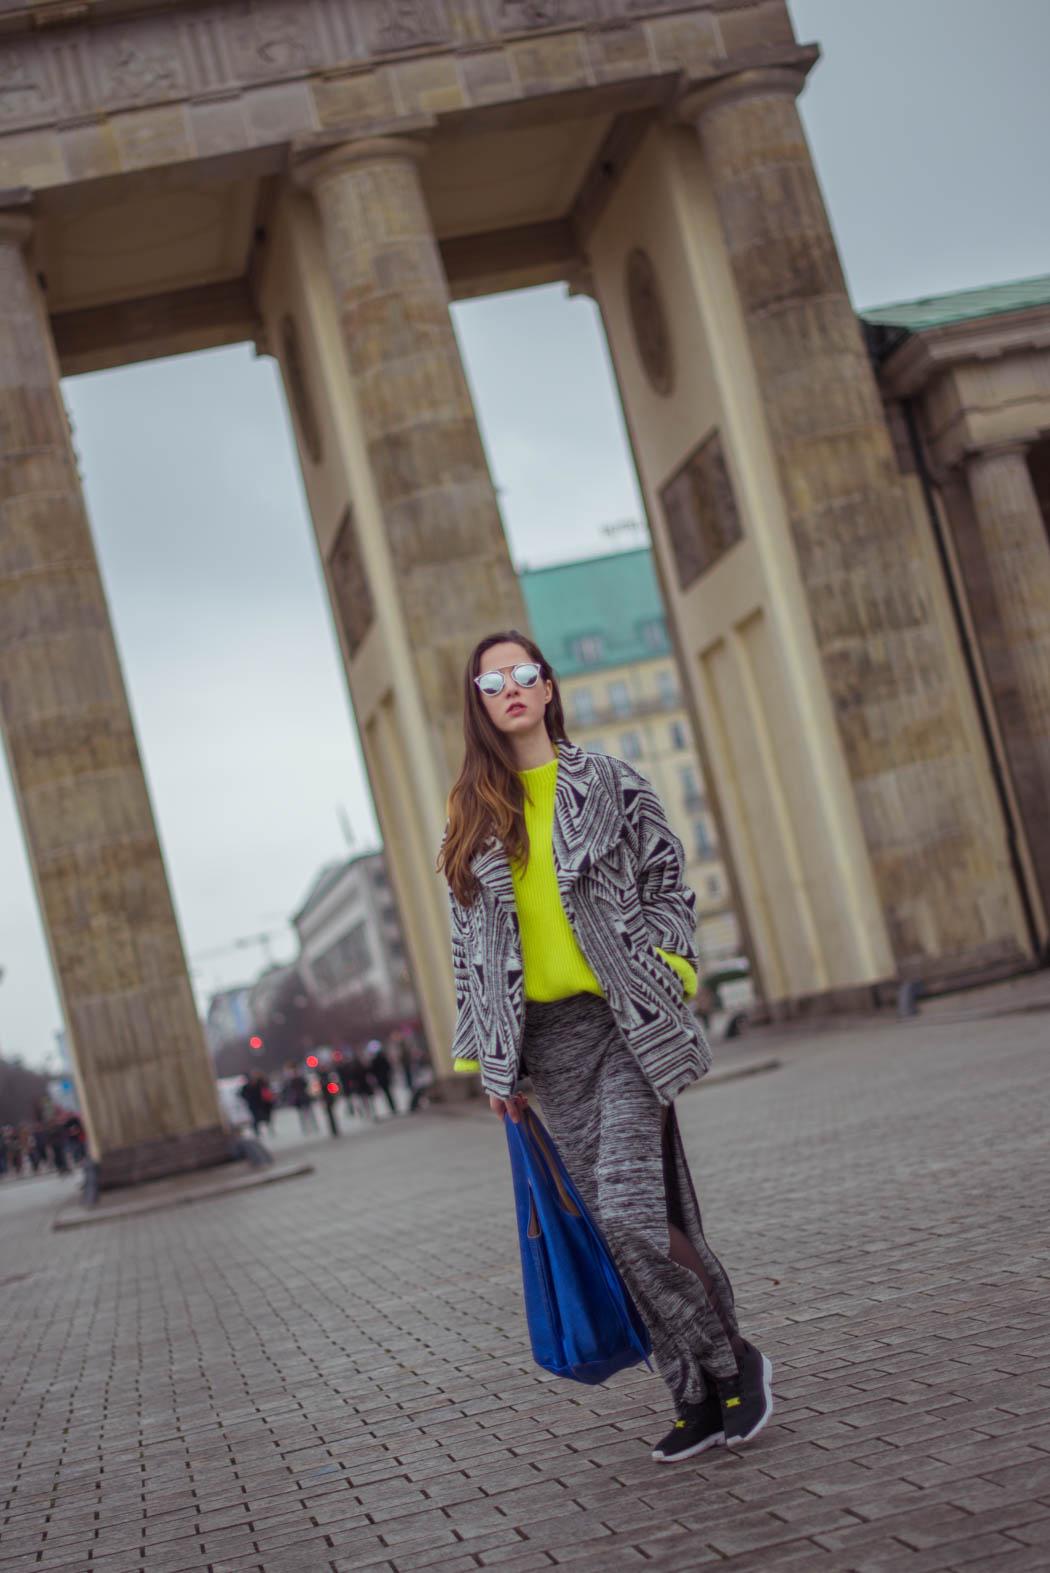 Dior-so-real-neongrüner-Pullover-Cos-Fashionblogger-München-Berlin-Deutschland-Lindarella-Streetstyle-3